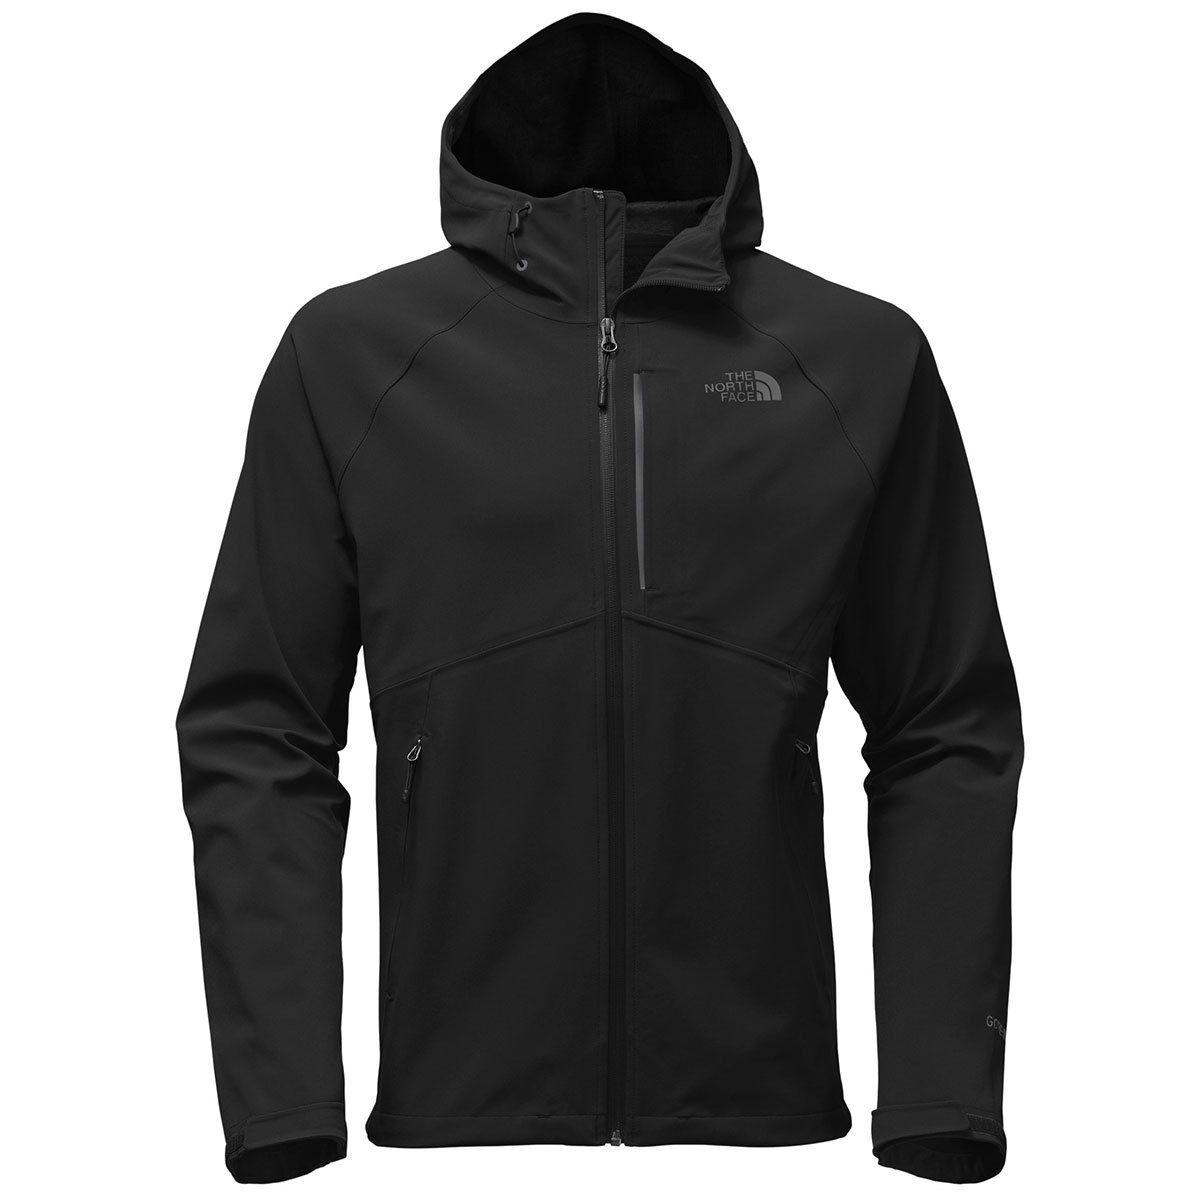 THE NORTH FACE Men's Apex Flex GTX Jacket in 2020 Mens